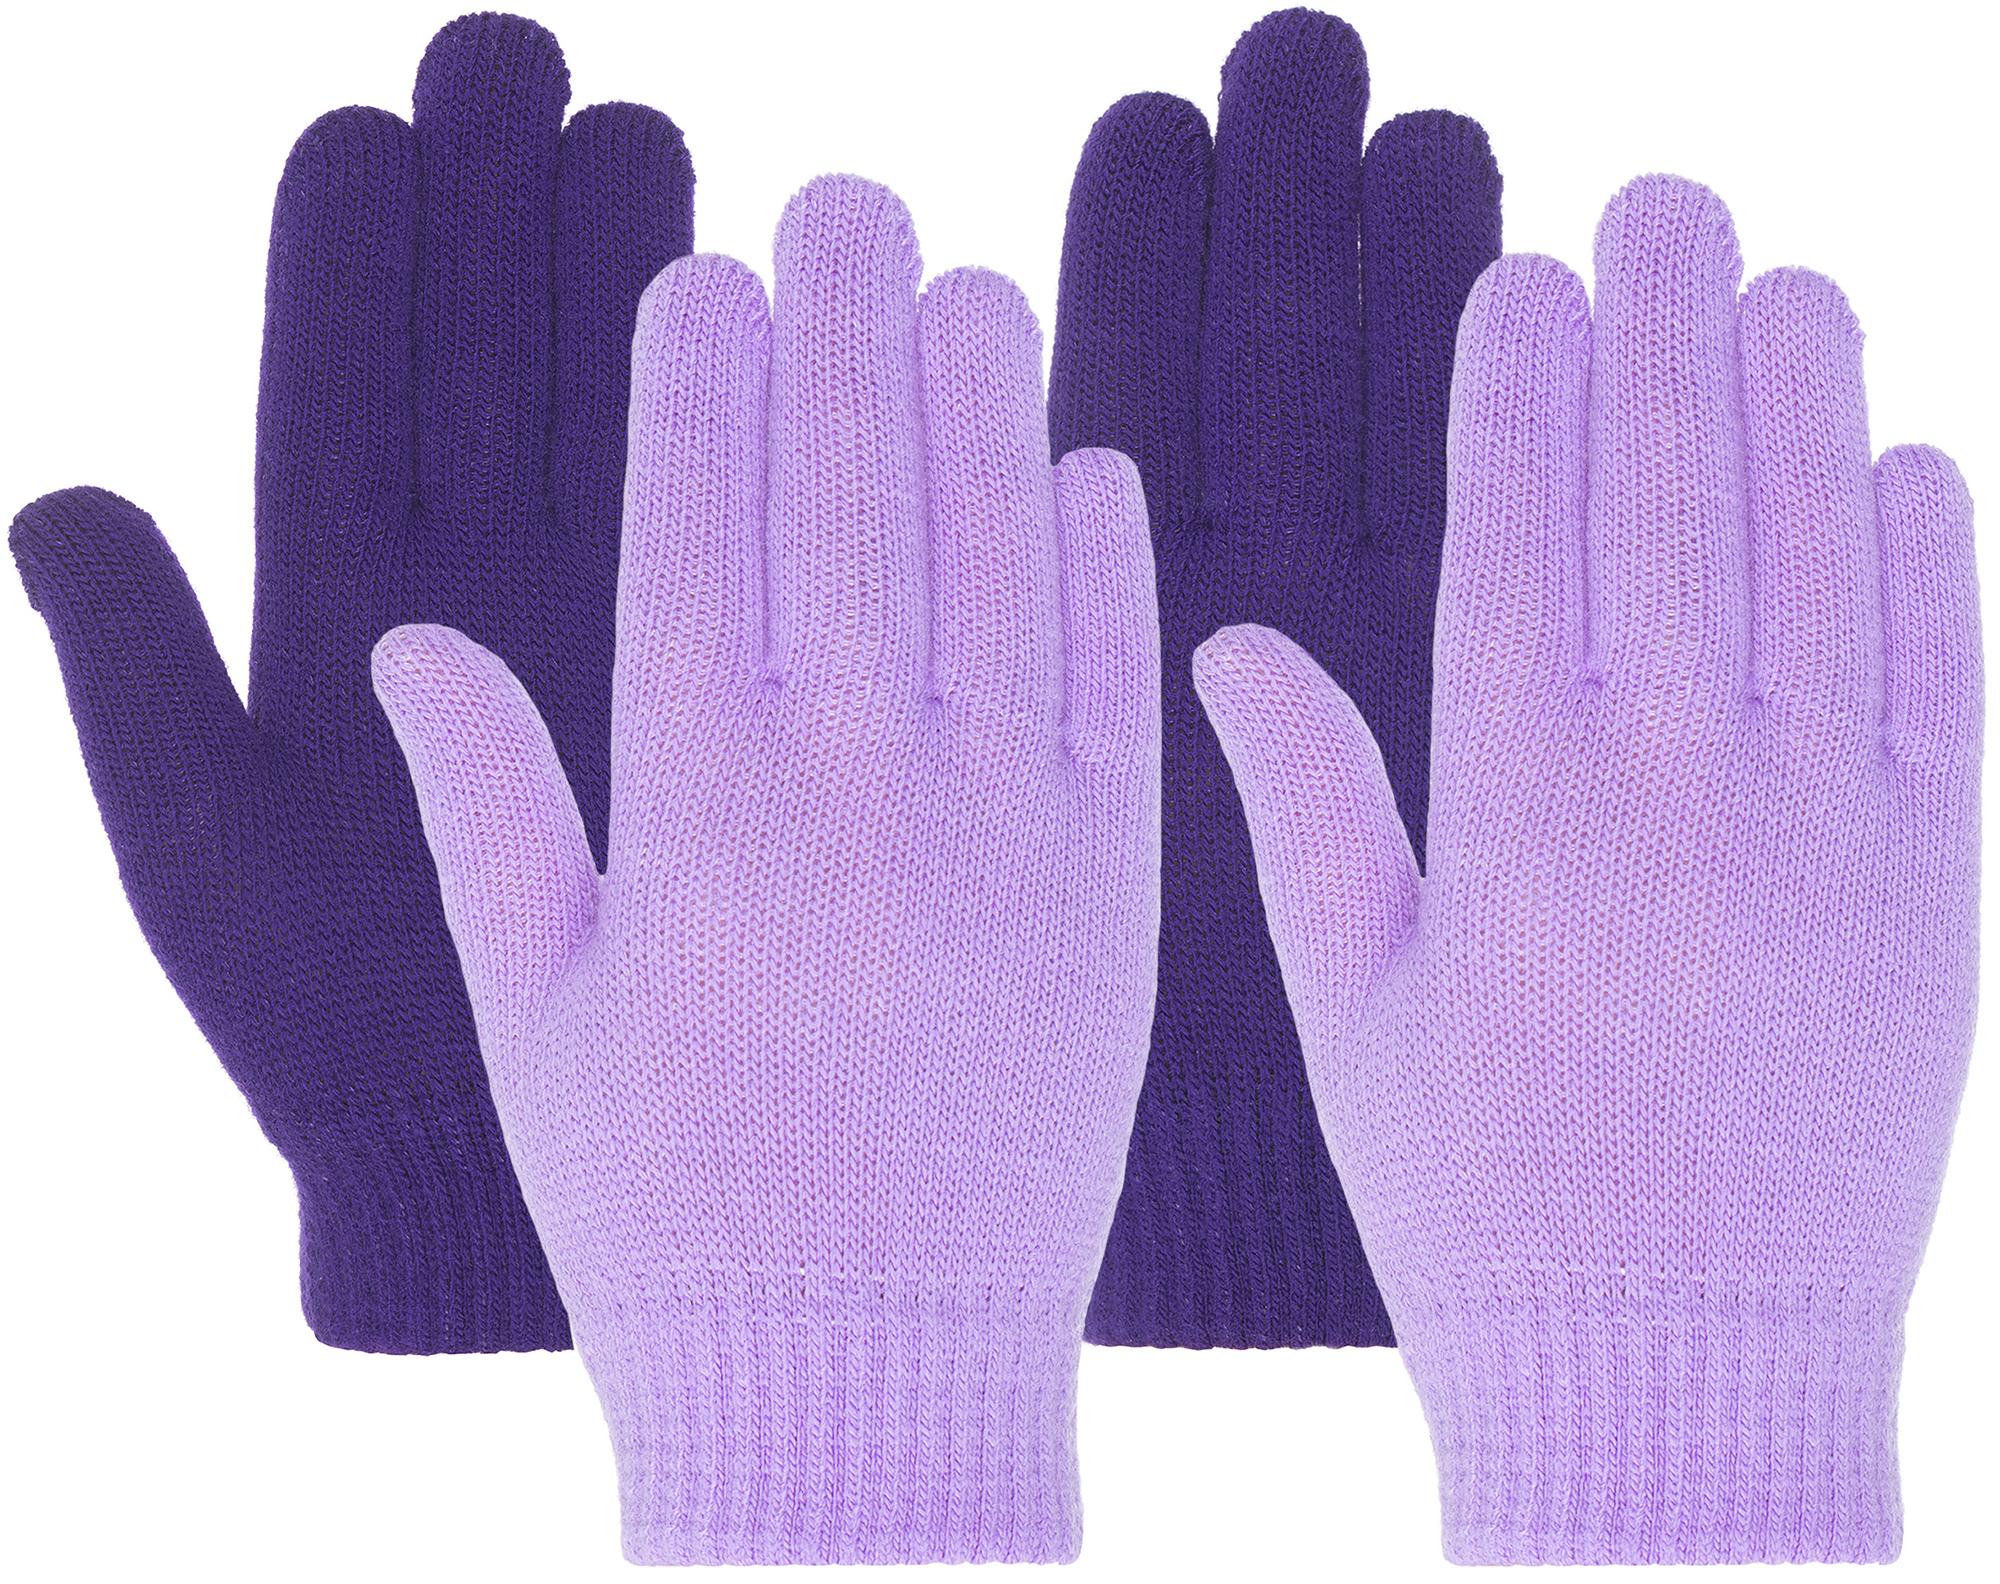 IcePeak Перчатки для девочек IcePeak, размер Без размера icepeak шапка для девочек icepeak lito размер без размера